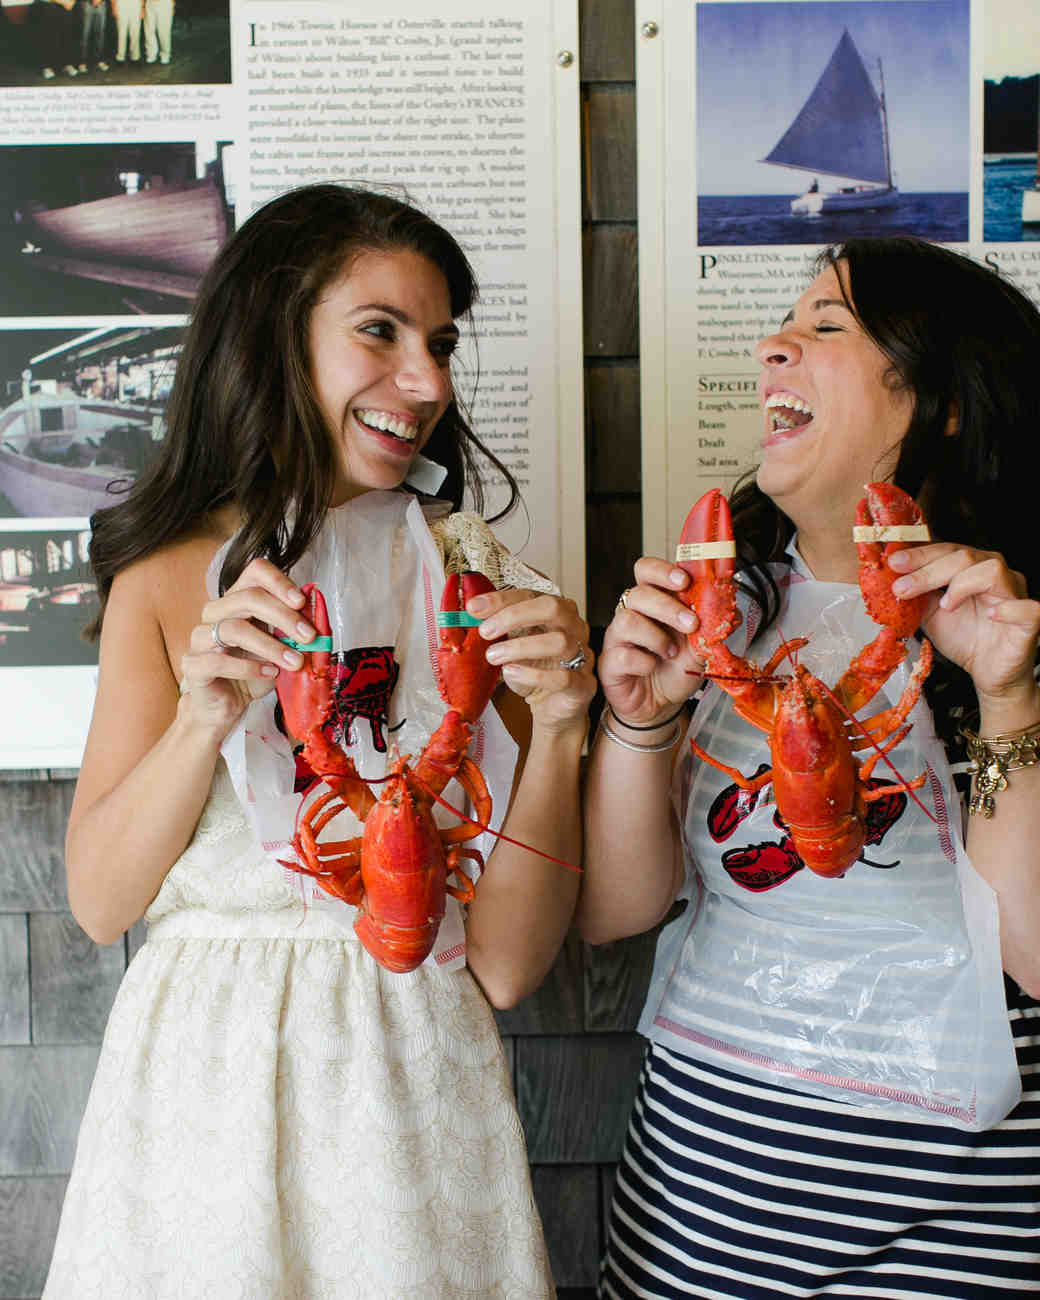 lindsay-garrett-rehearsaldinner-lobster-0215-s111850-0415.jpg